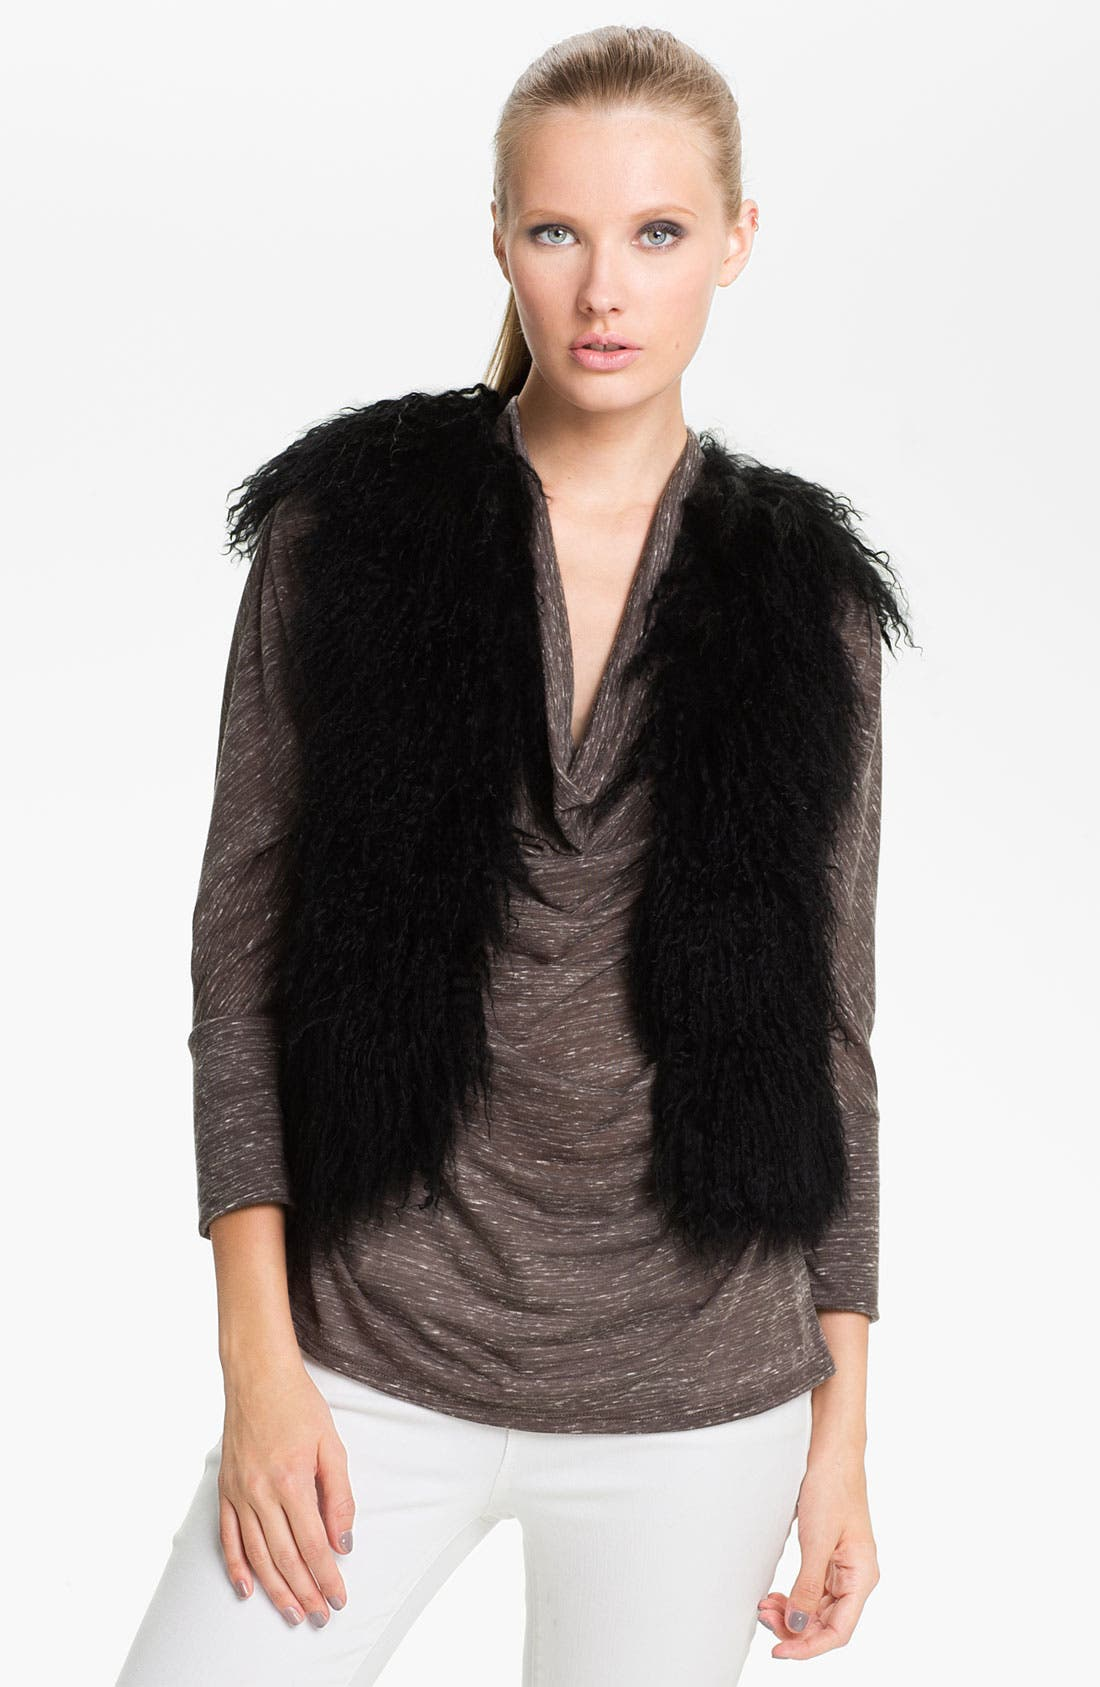 Alternate Image 1 Selected - Jessica Wilde Genuine Tibetan Lamb Fur & Knit Vest